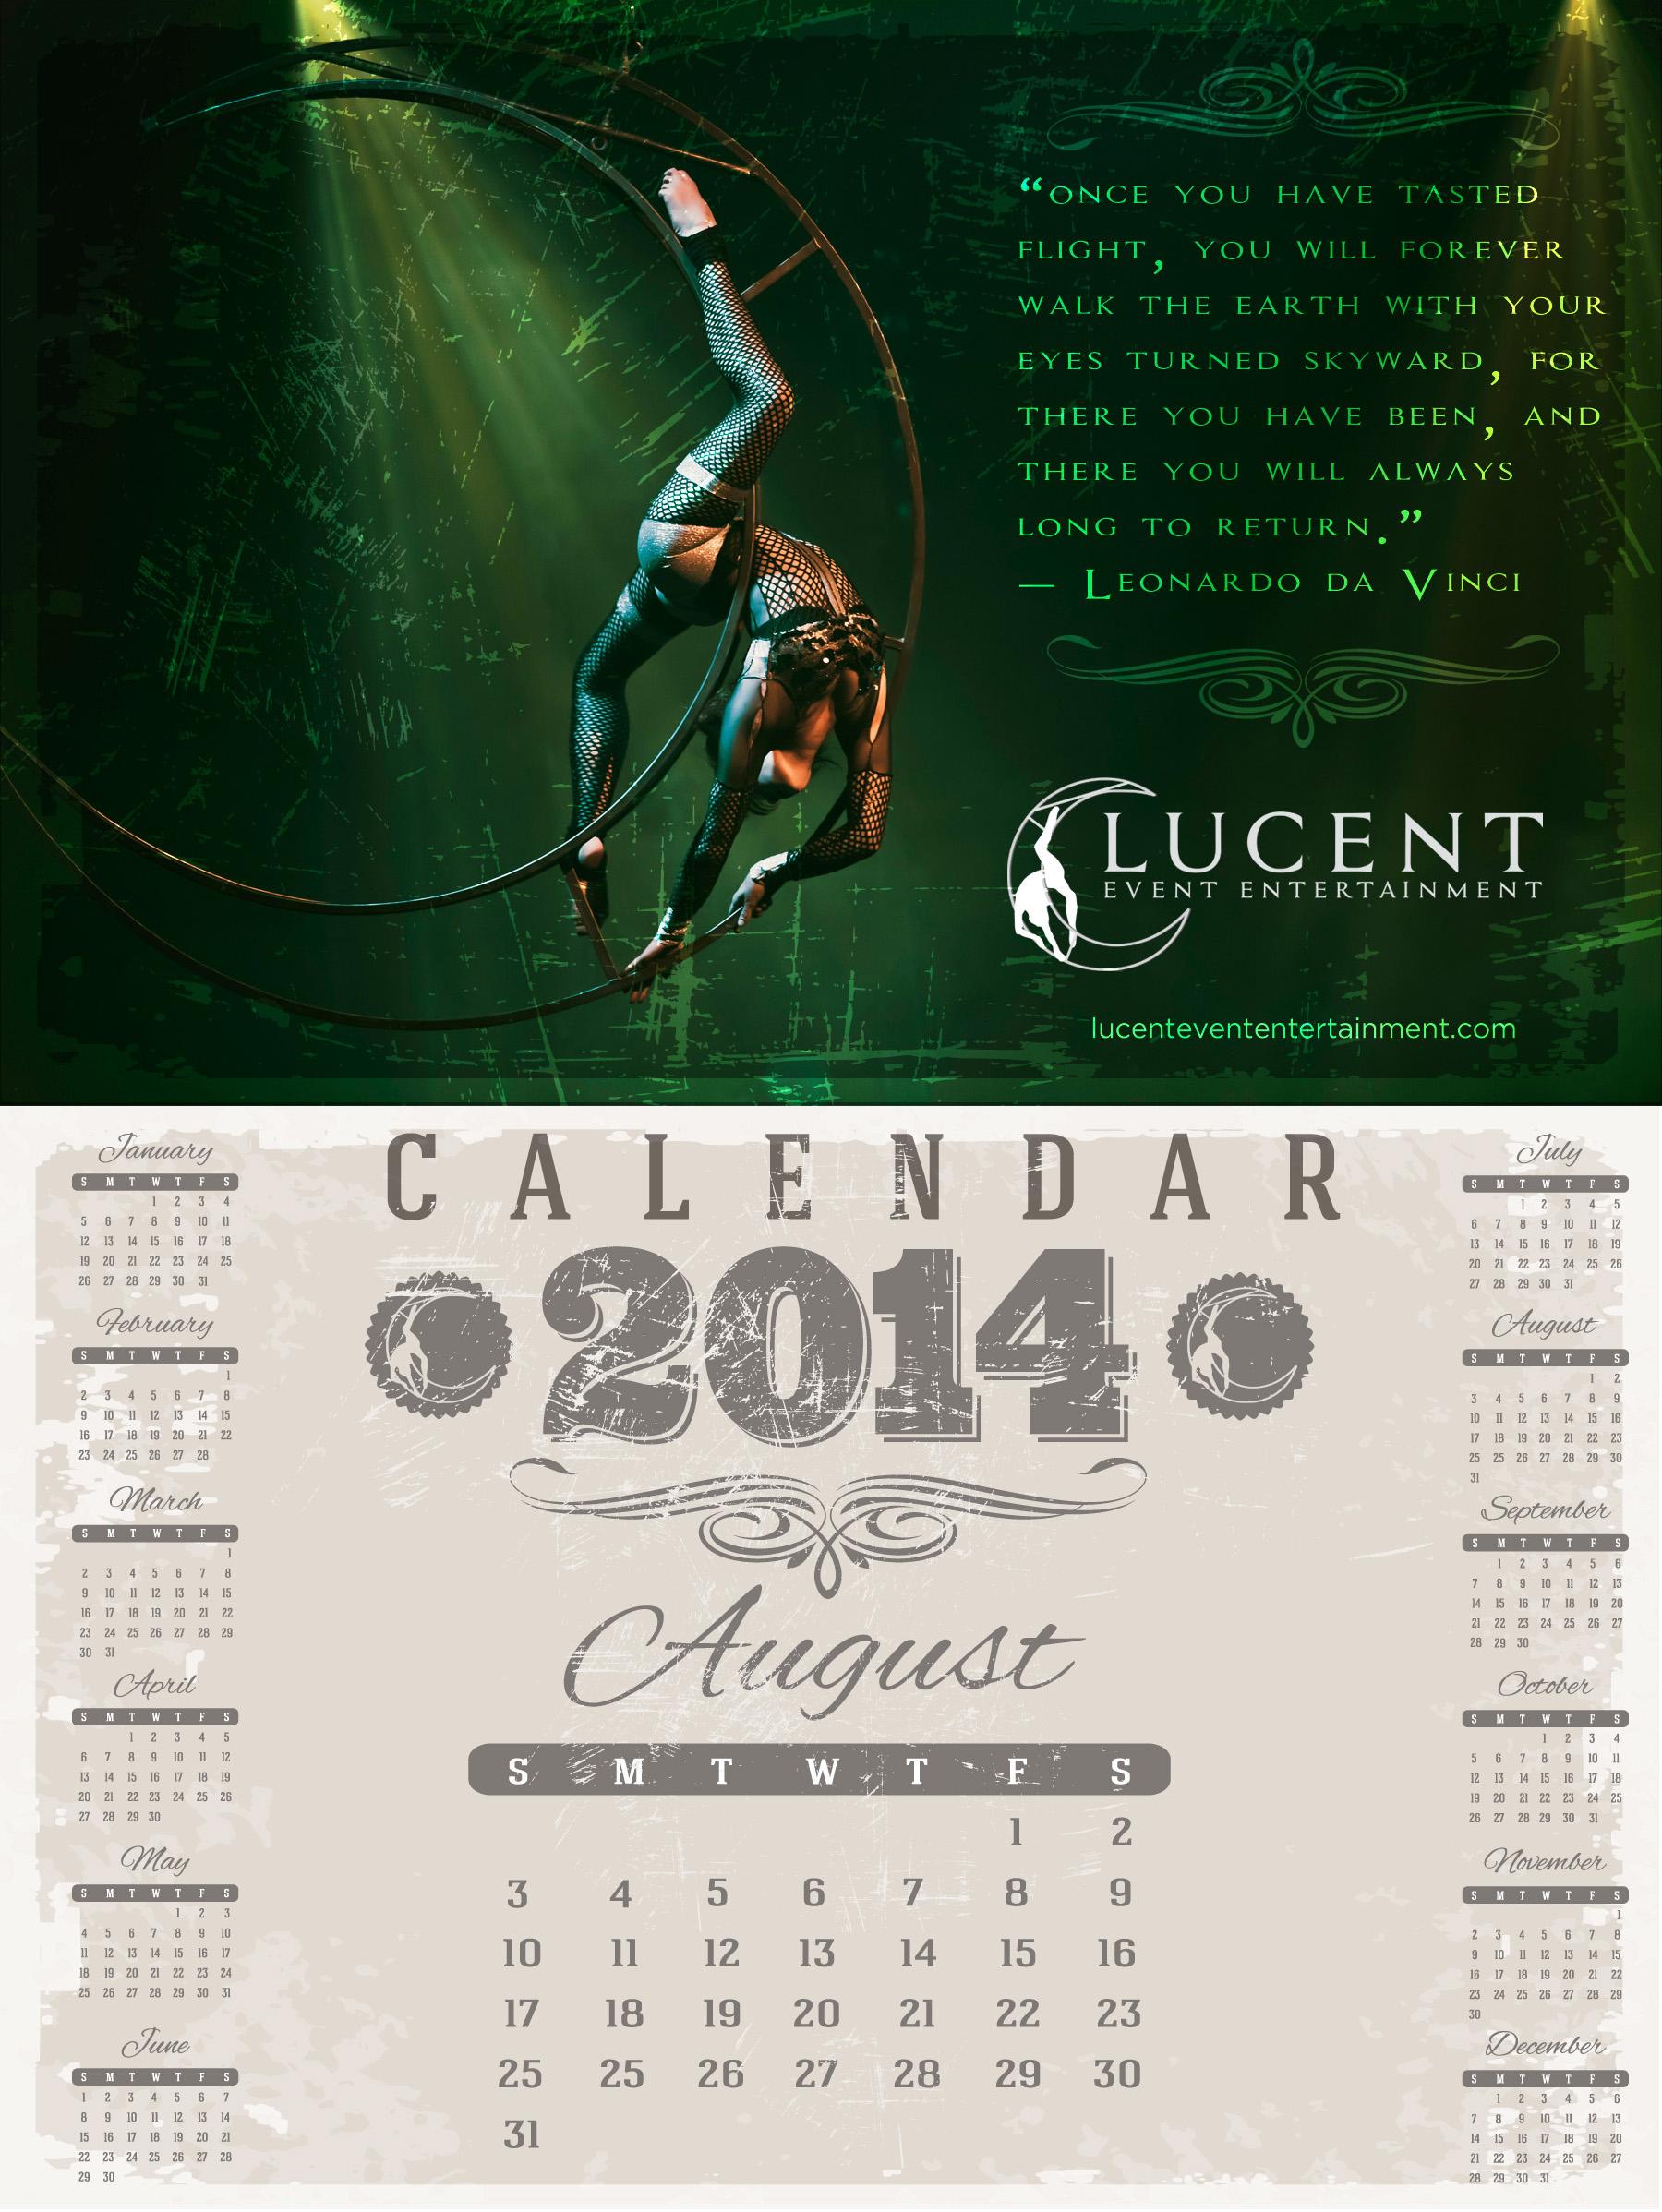 Lucent Dossier – Mailer Design